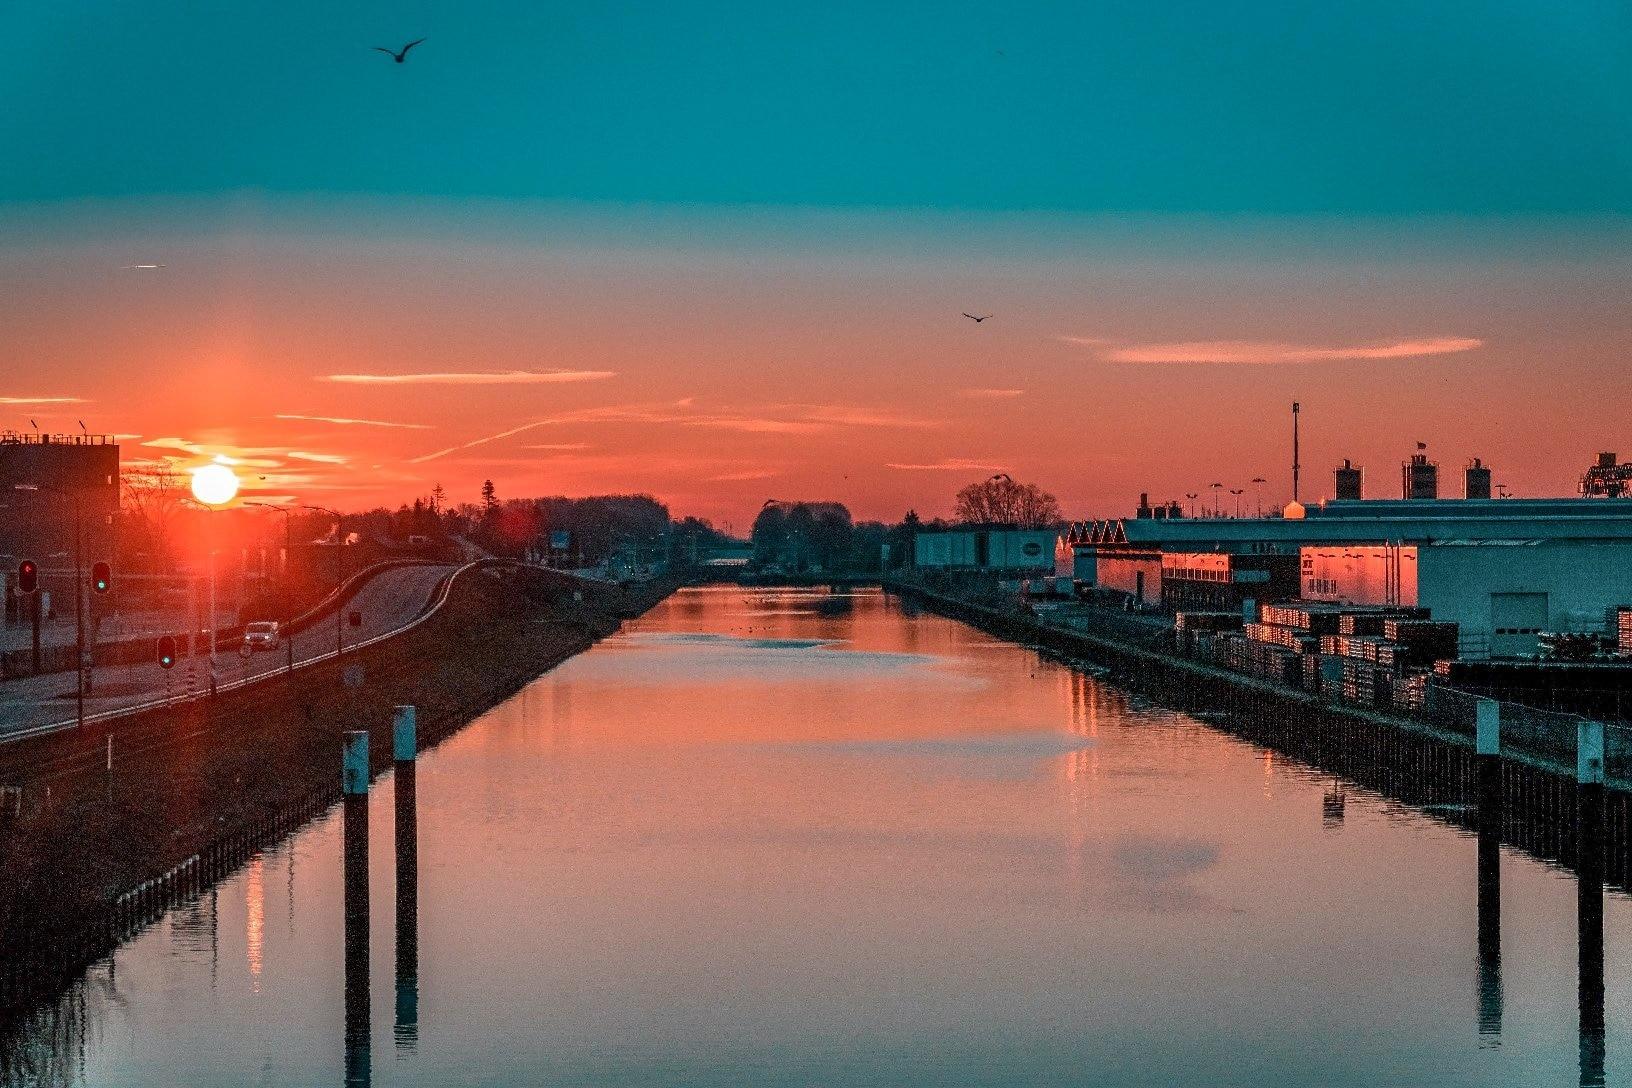 Veghel, Municipality of Meierijstad, North Brabant, Netherlands